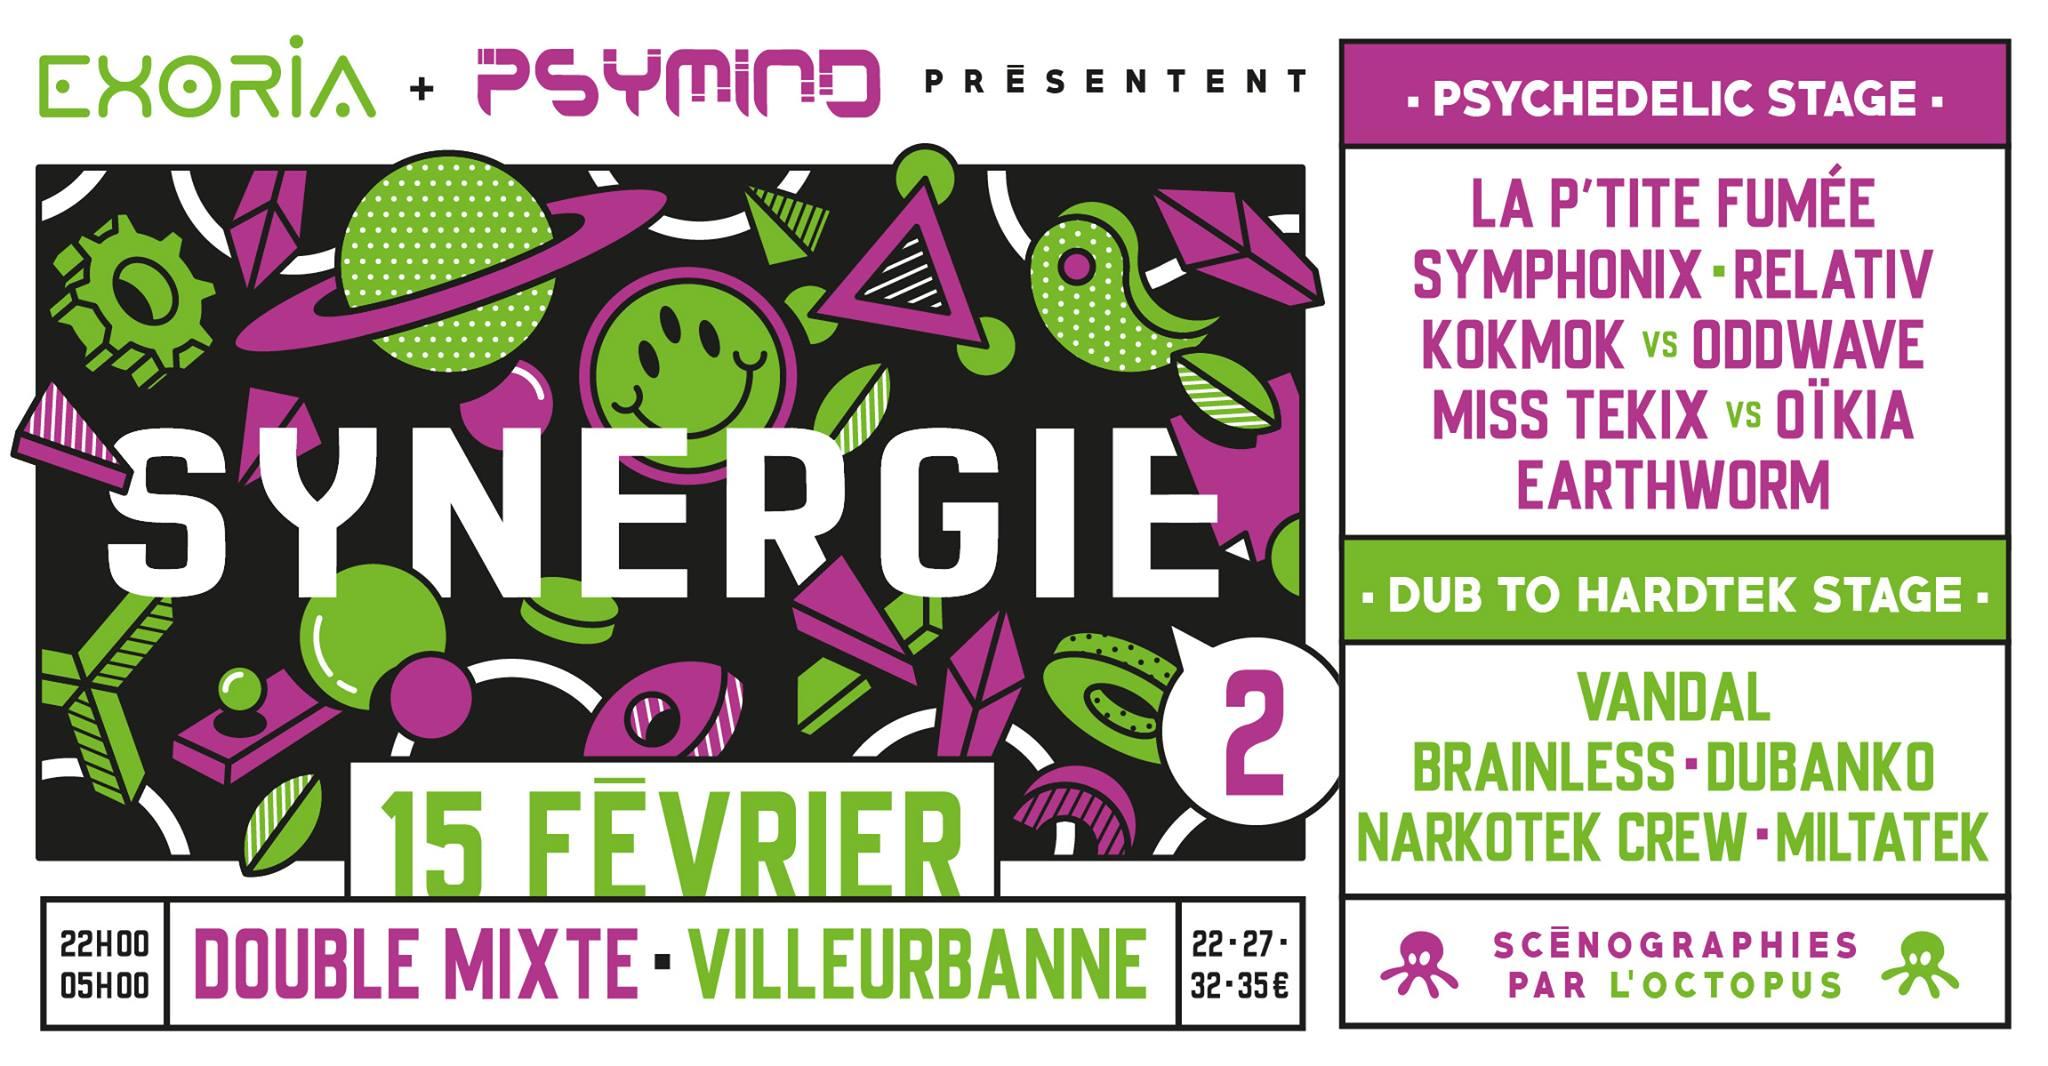 Synergie #2 | 2 Stages : Dub to Hardtek // Prog to Psytrance